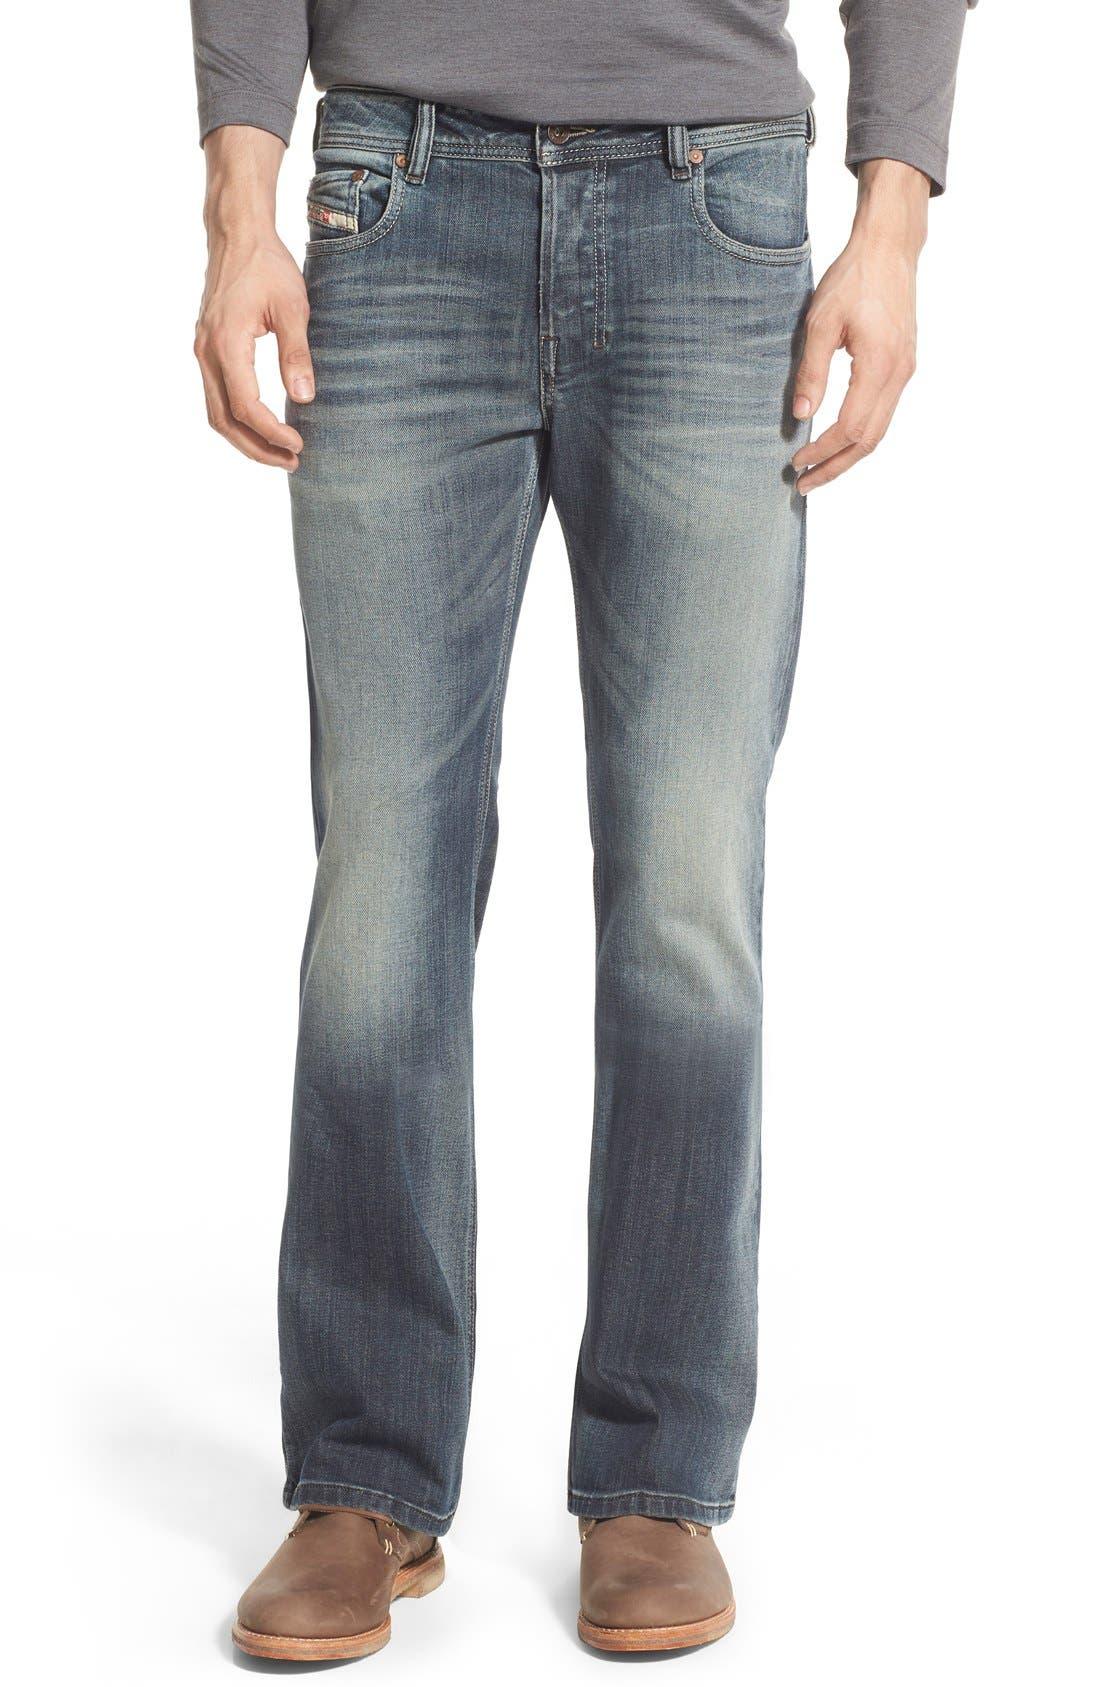 'Zathan' Bootcut Jeans,                             Main thumbnail 1, color,                             885K